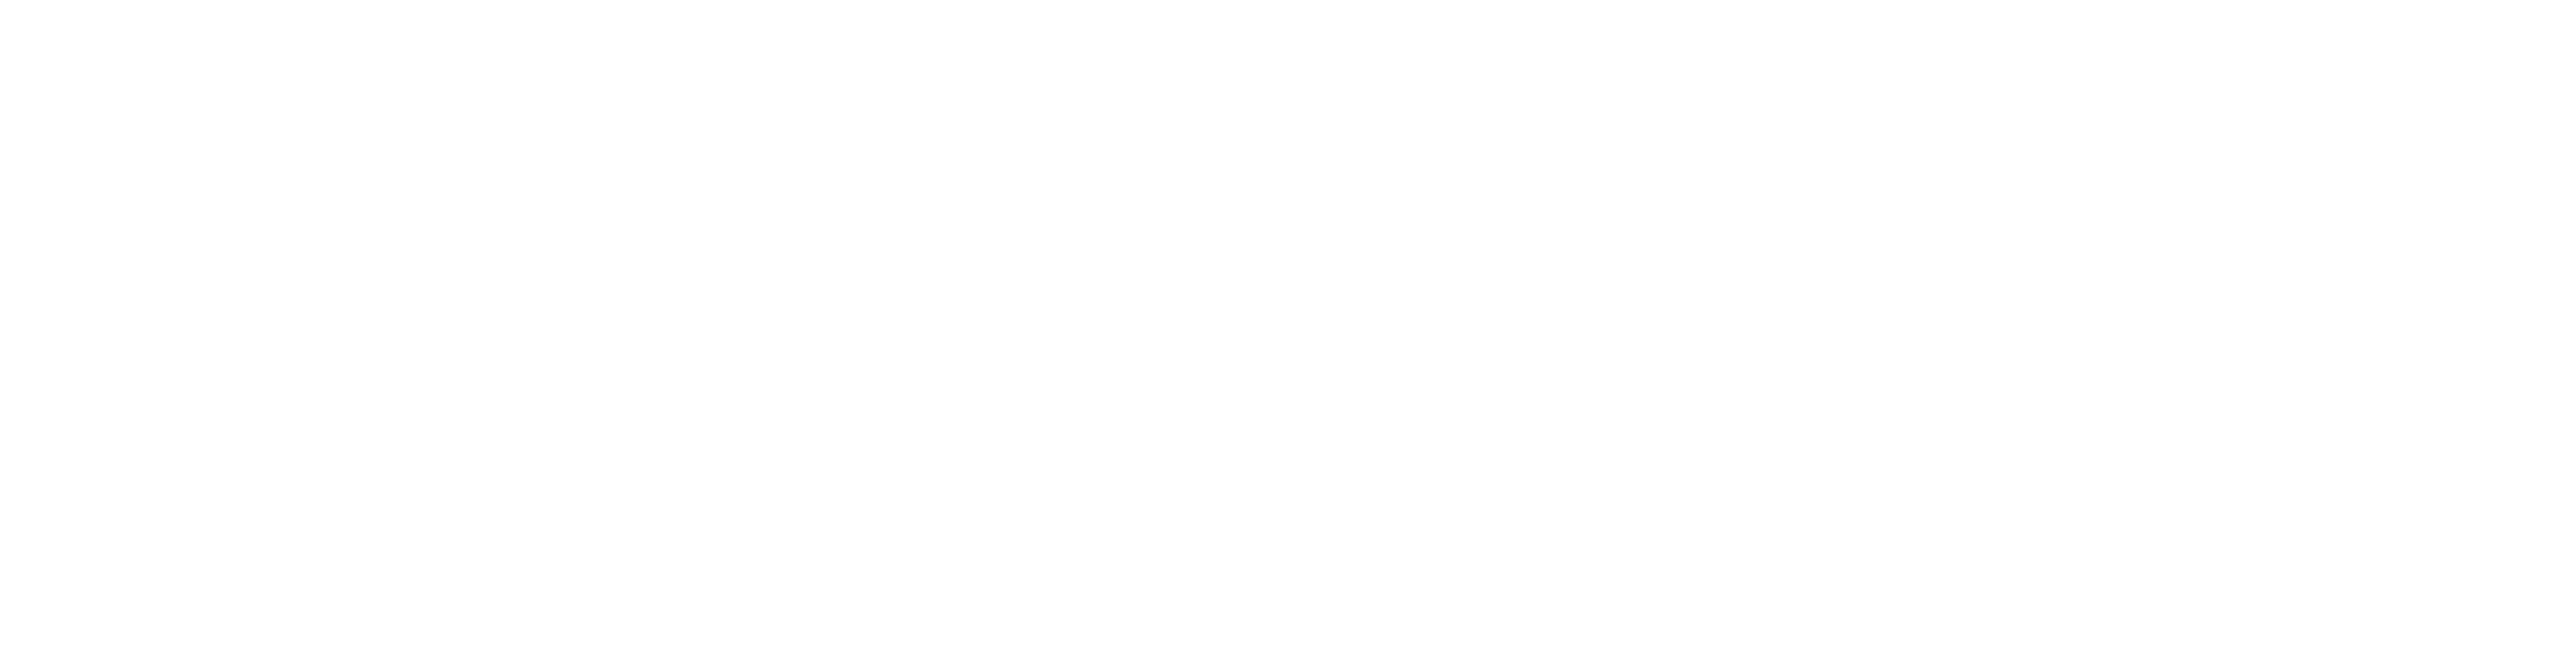 002_dommedia-schriftzug_WHITE